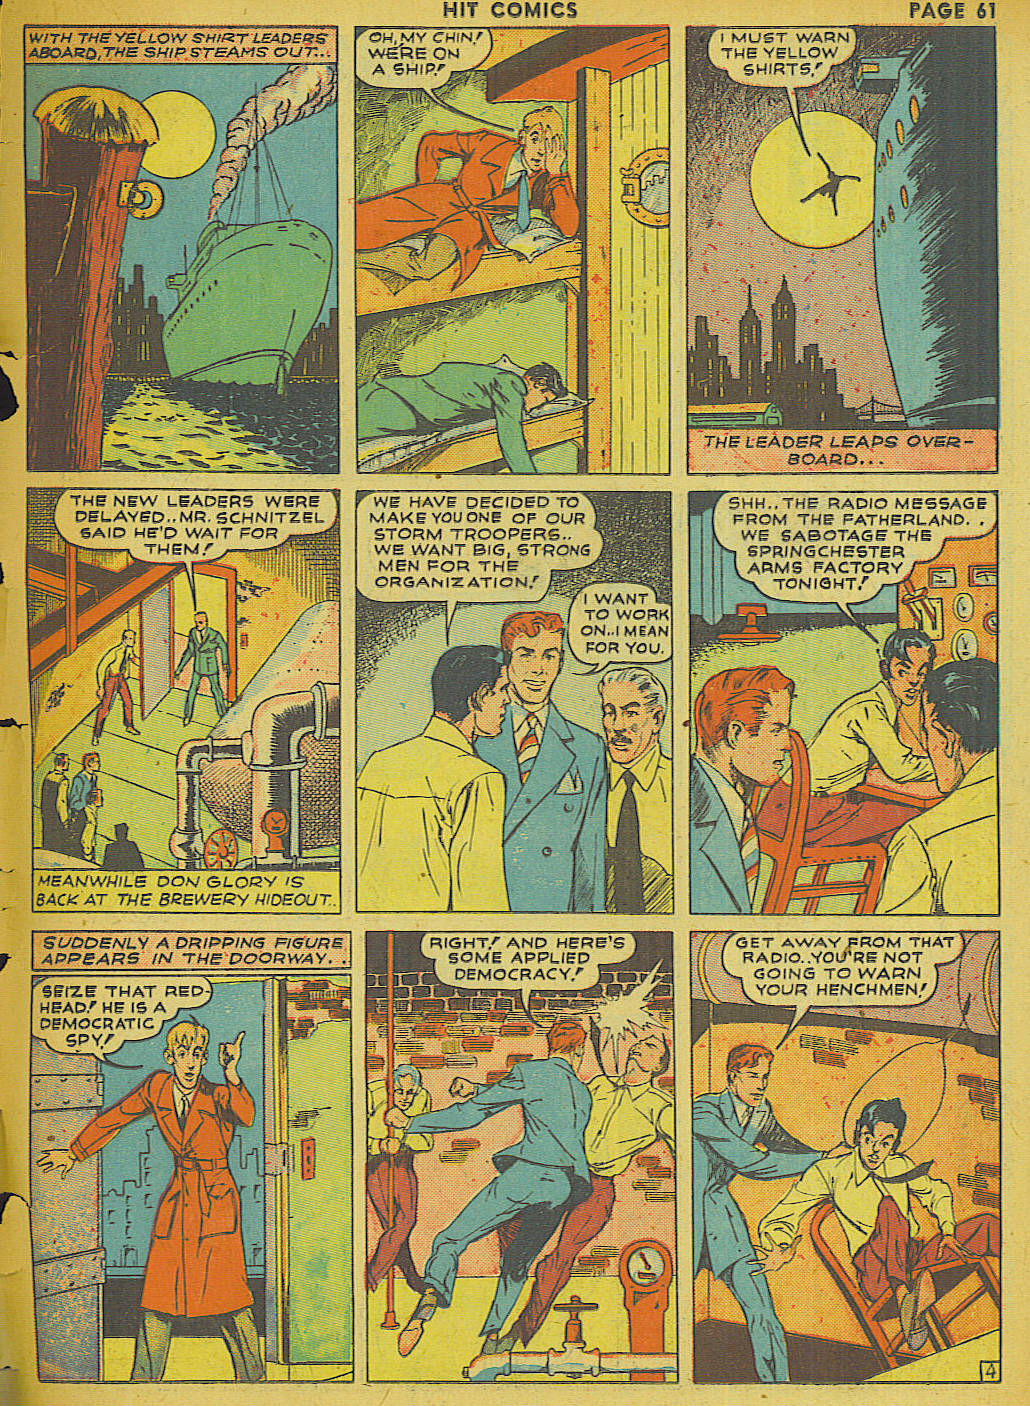 Read online Hit Comics comic -  Issue #13 - 63